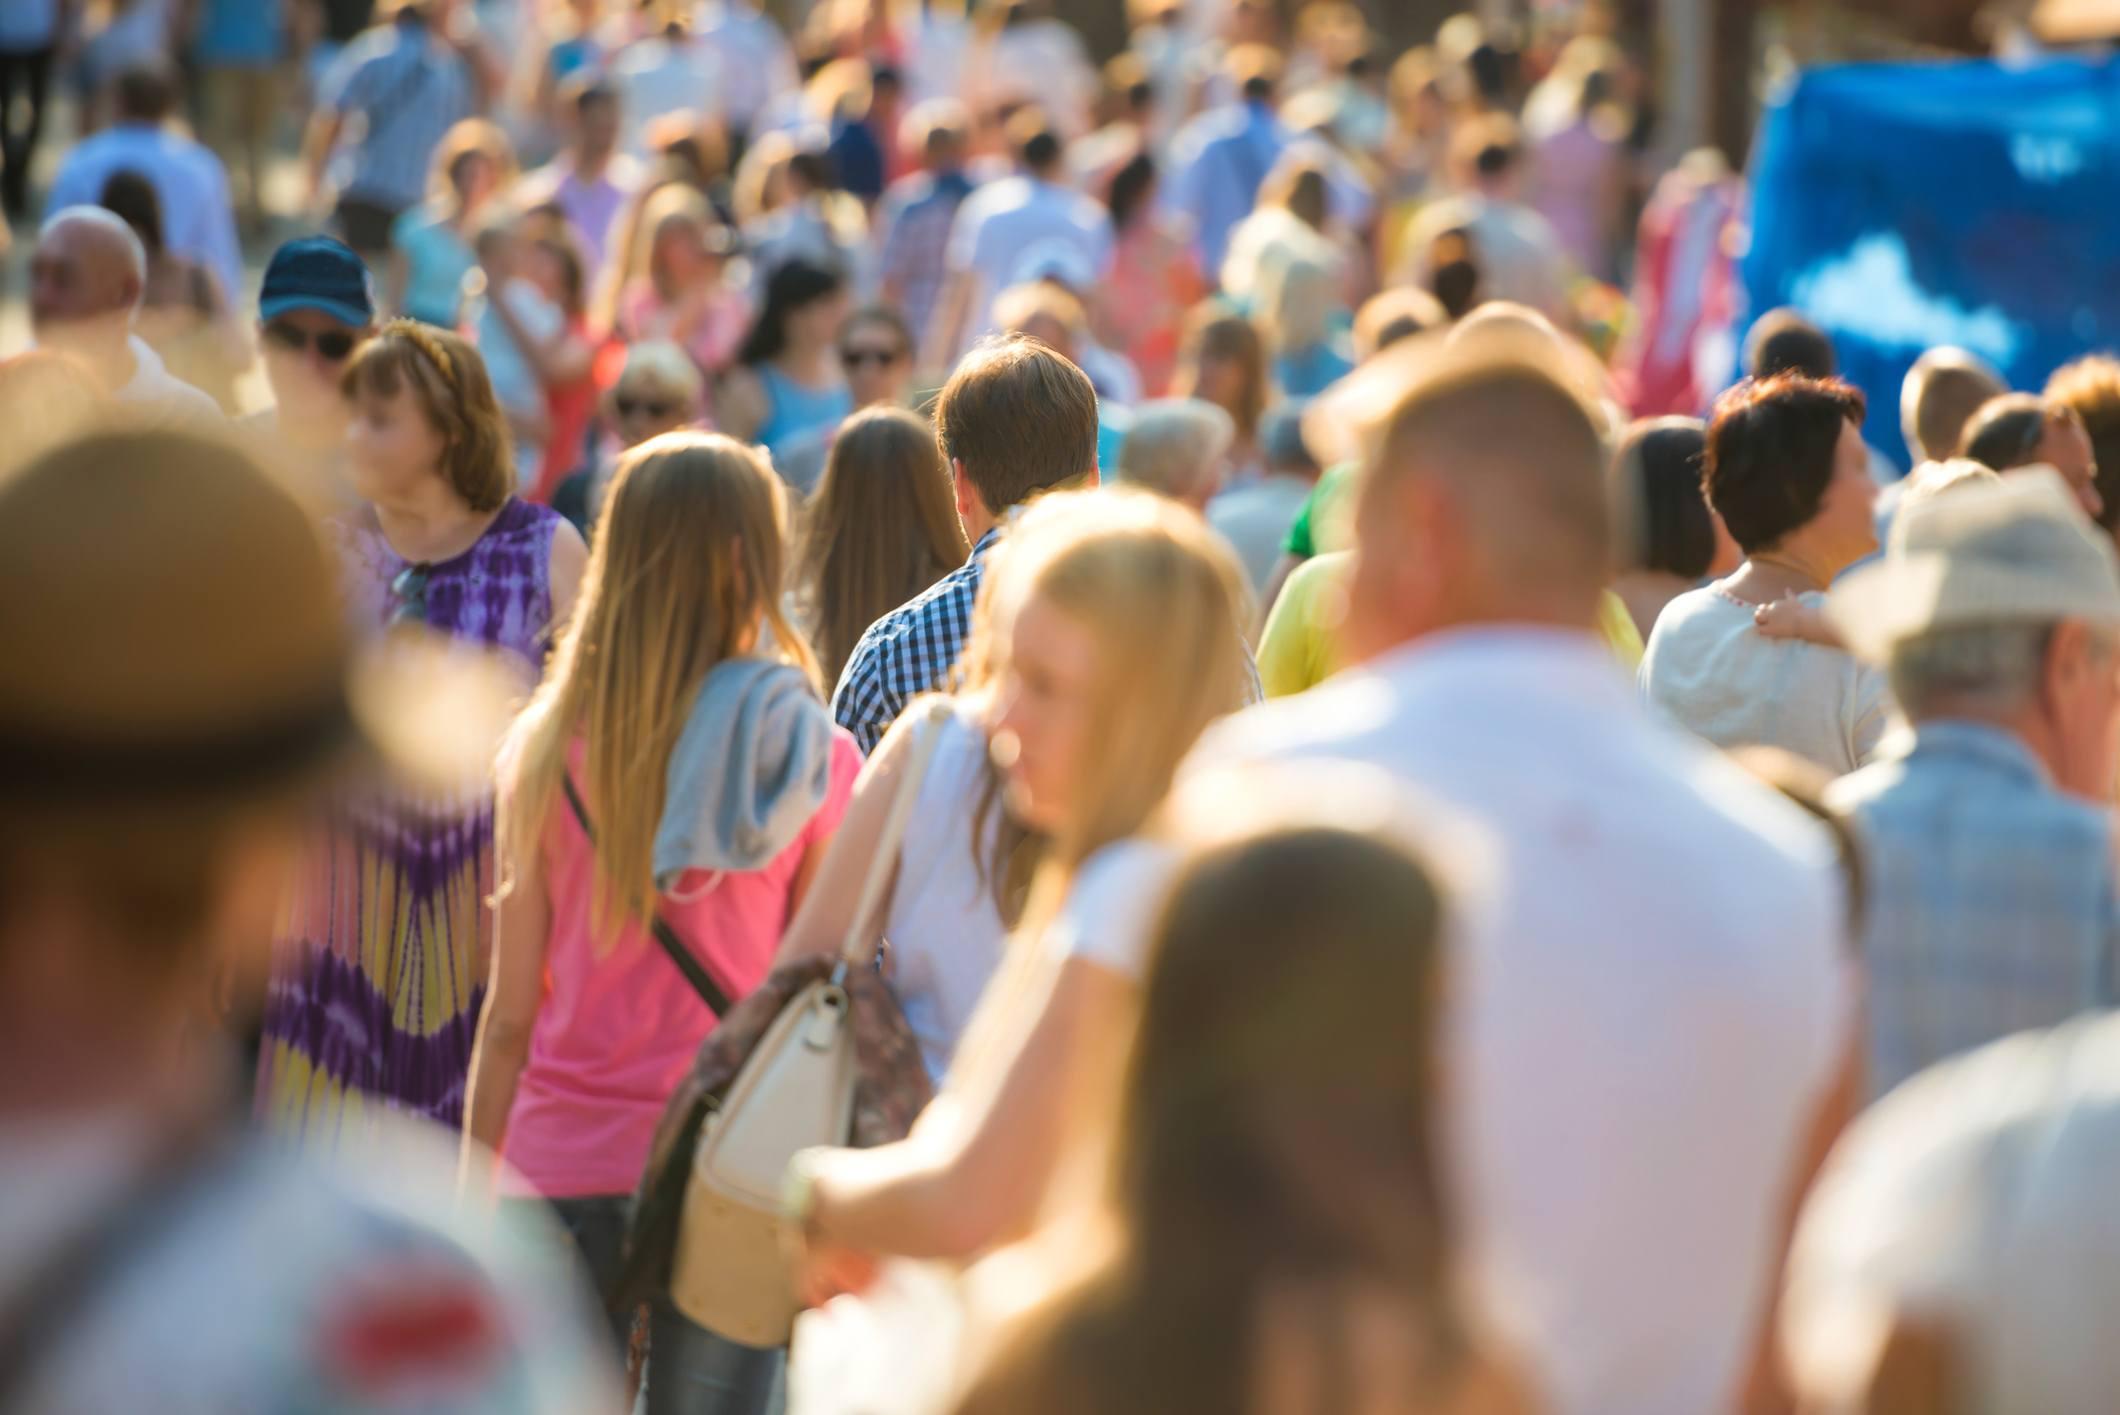 People walking on the city street.